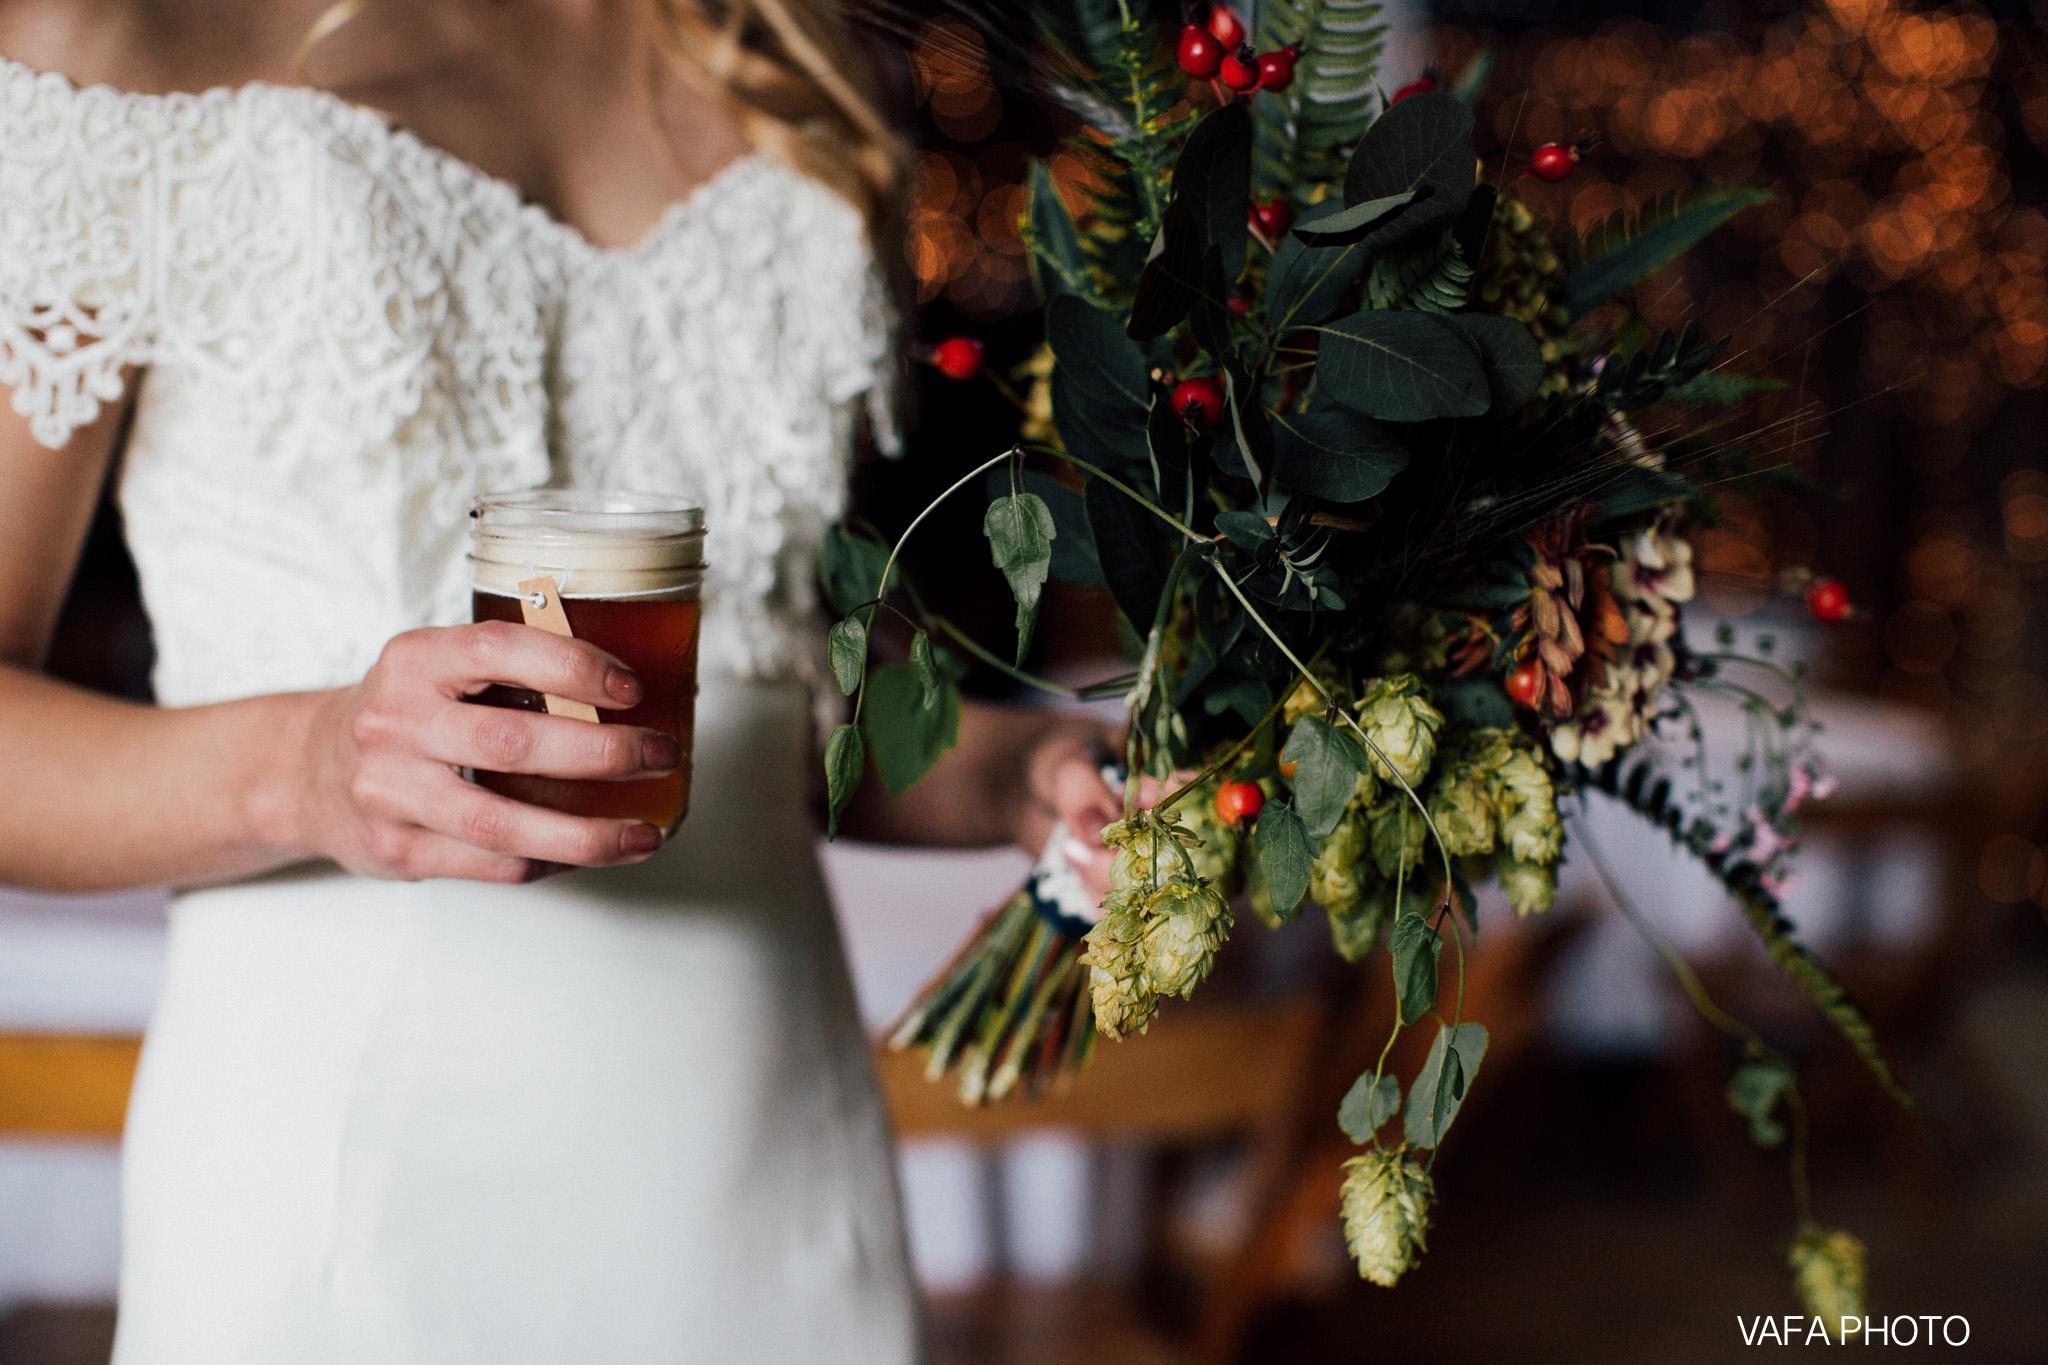 Belsolda-Farm-Wedding-Christy-Eric-Vafa-Photo-620.jpg